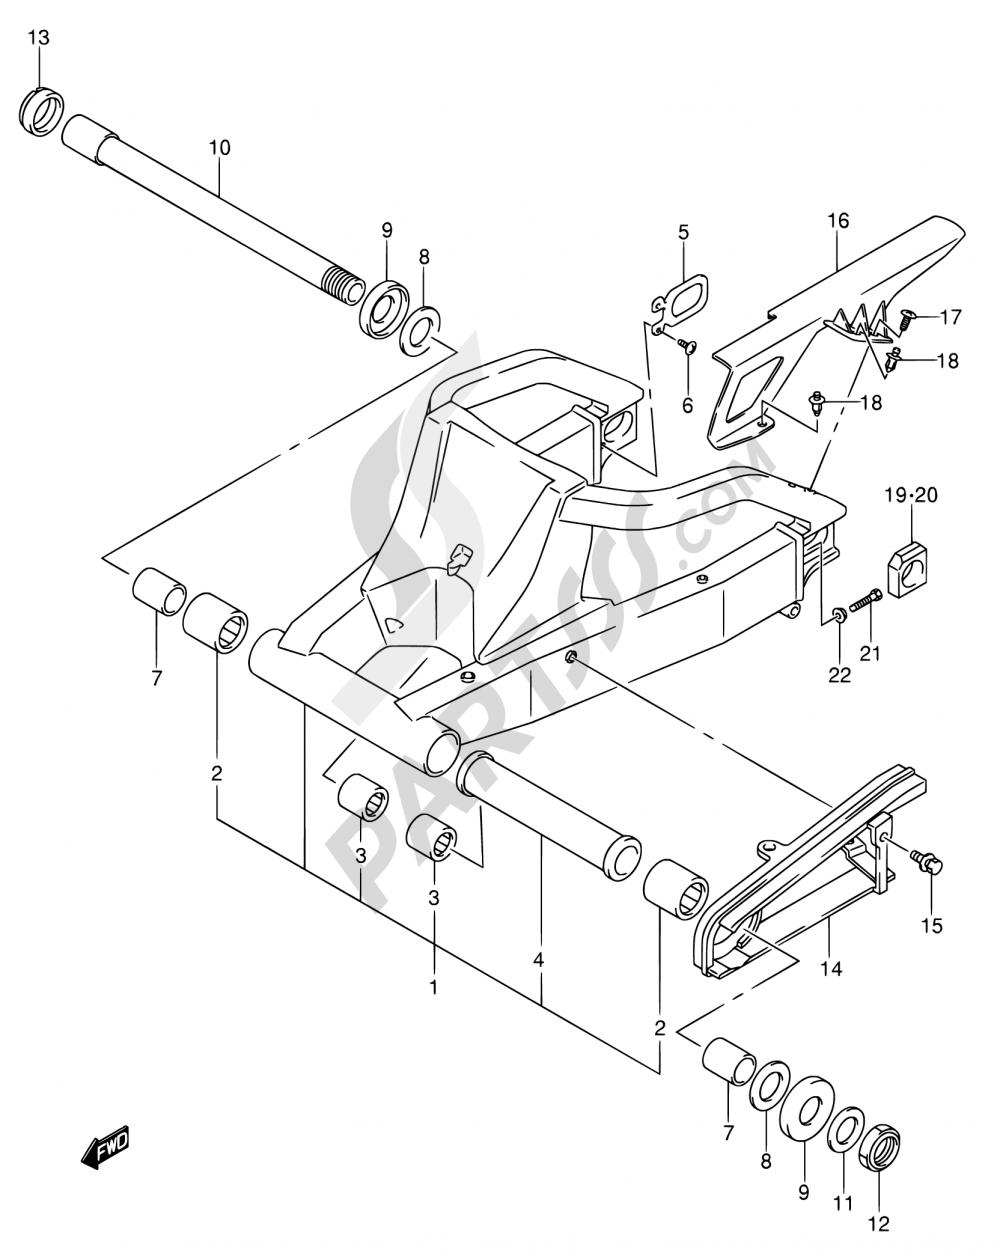 58 - REAR SWINGING ARM Suzuki GSX-R750 2004